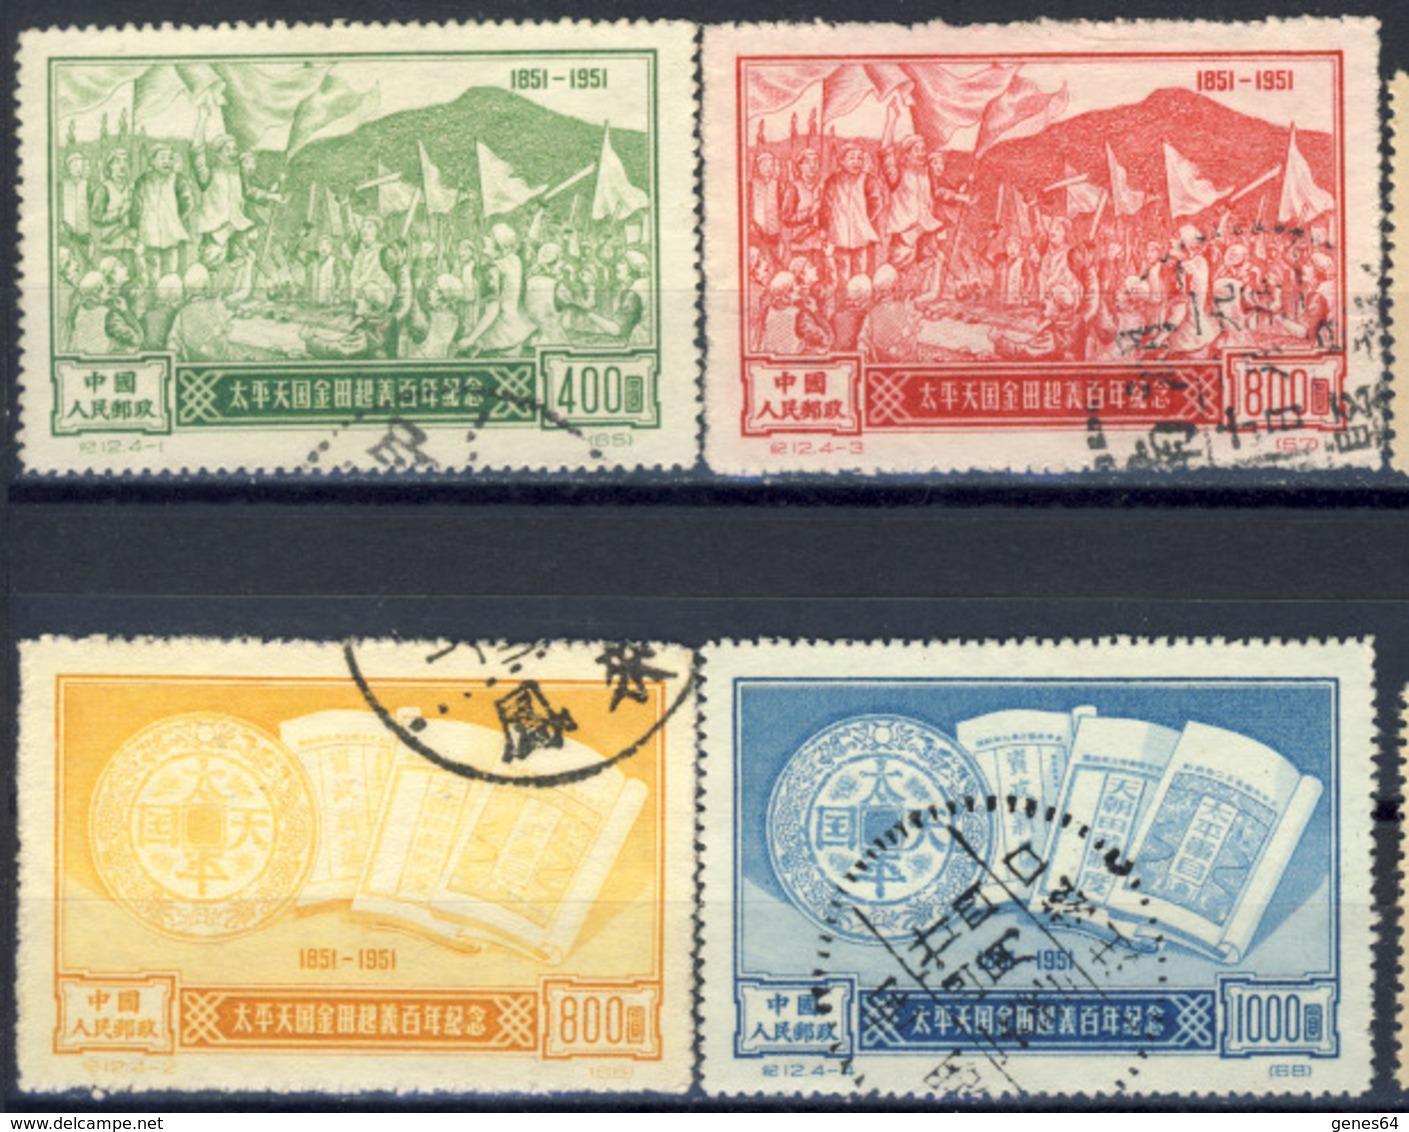 P.R.C. 1951 - Centenary Of Taiping Rebellion - Set Complet Used - ORIGINAL PRINT - Gebraucht